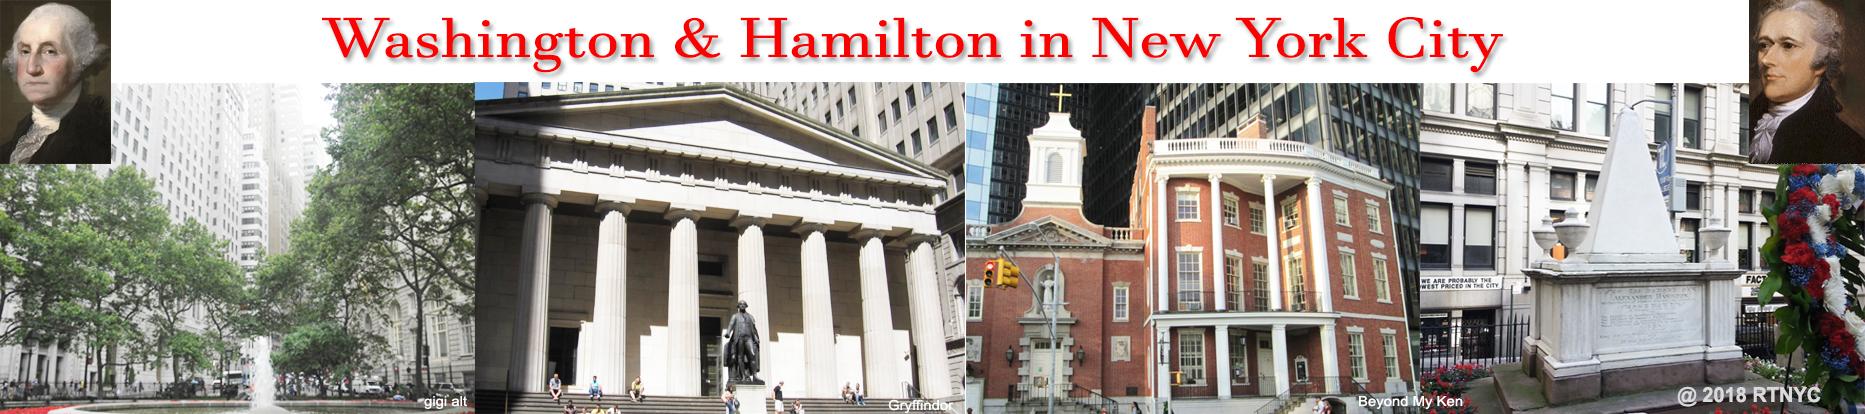 Washington-Hamilton-New-Yorik-City-Bruce-Racond.jpg